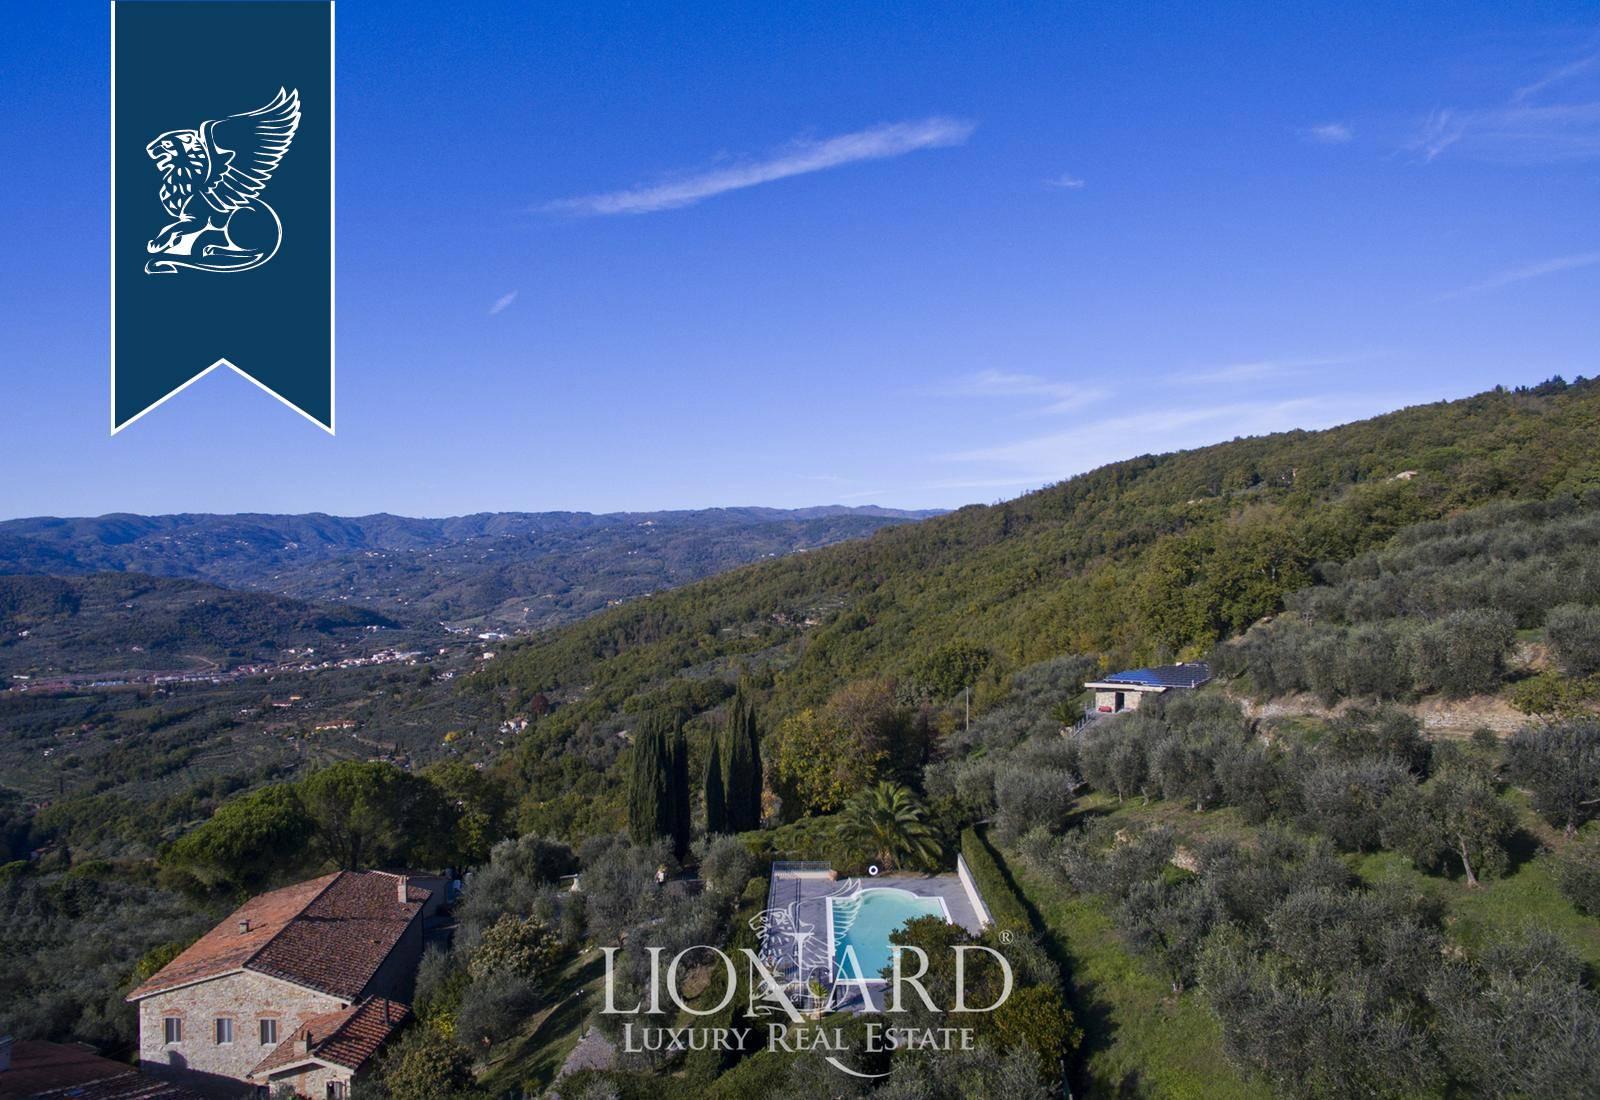 Agriturismo in Vendita a Monsummano Terme: 0 locali, 700 mq - Foto 4